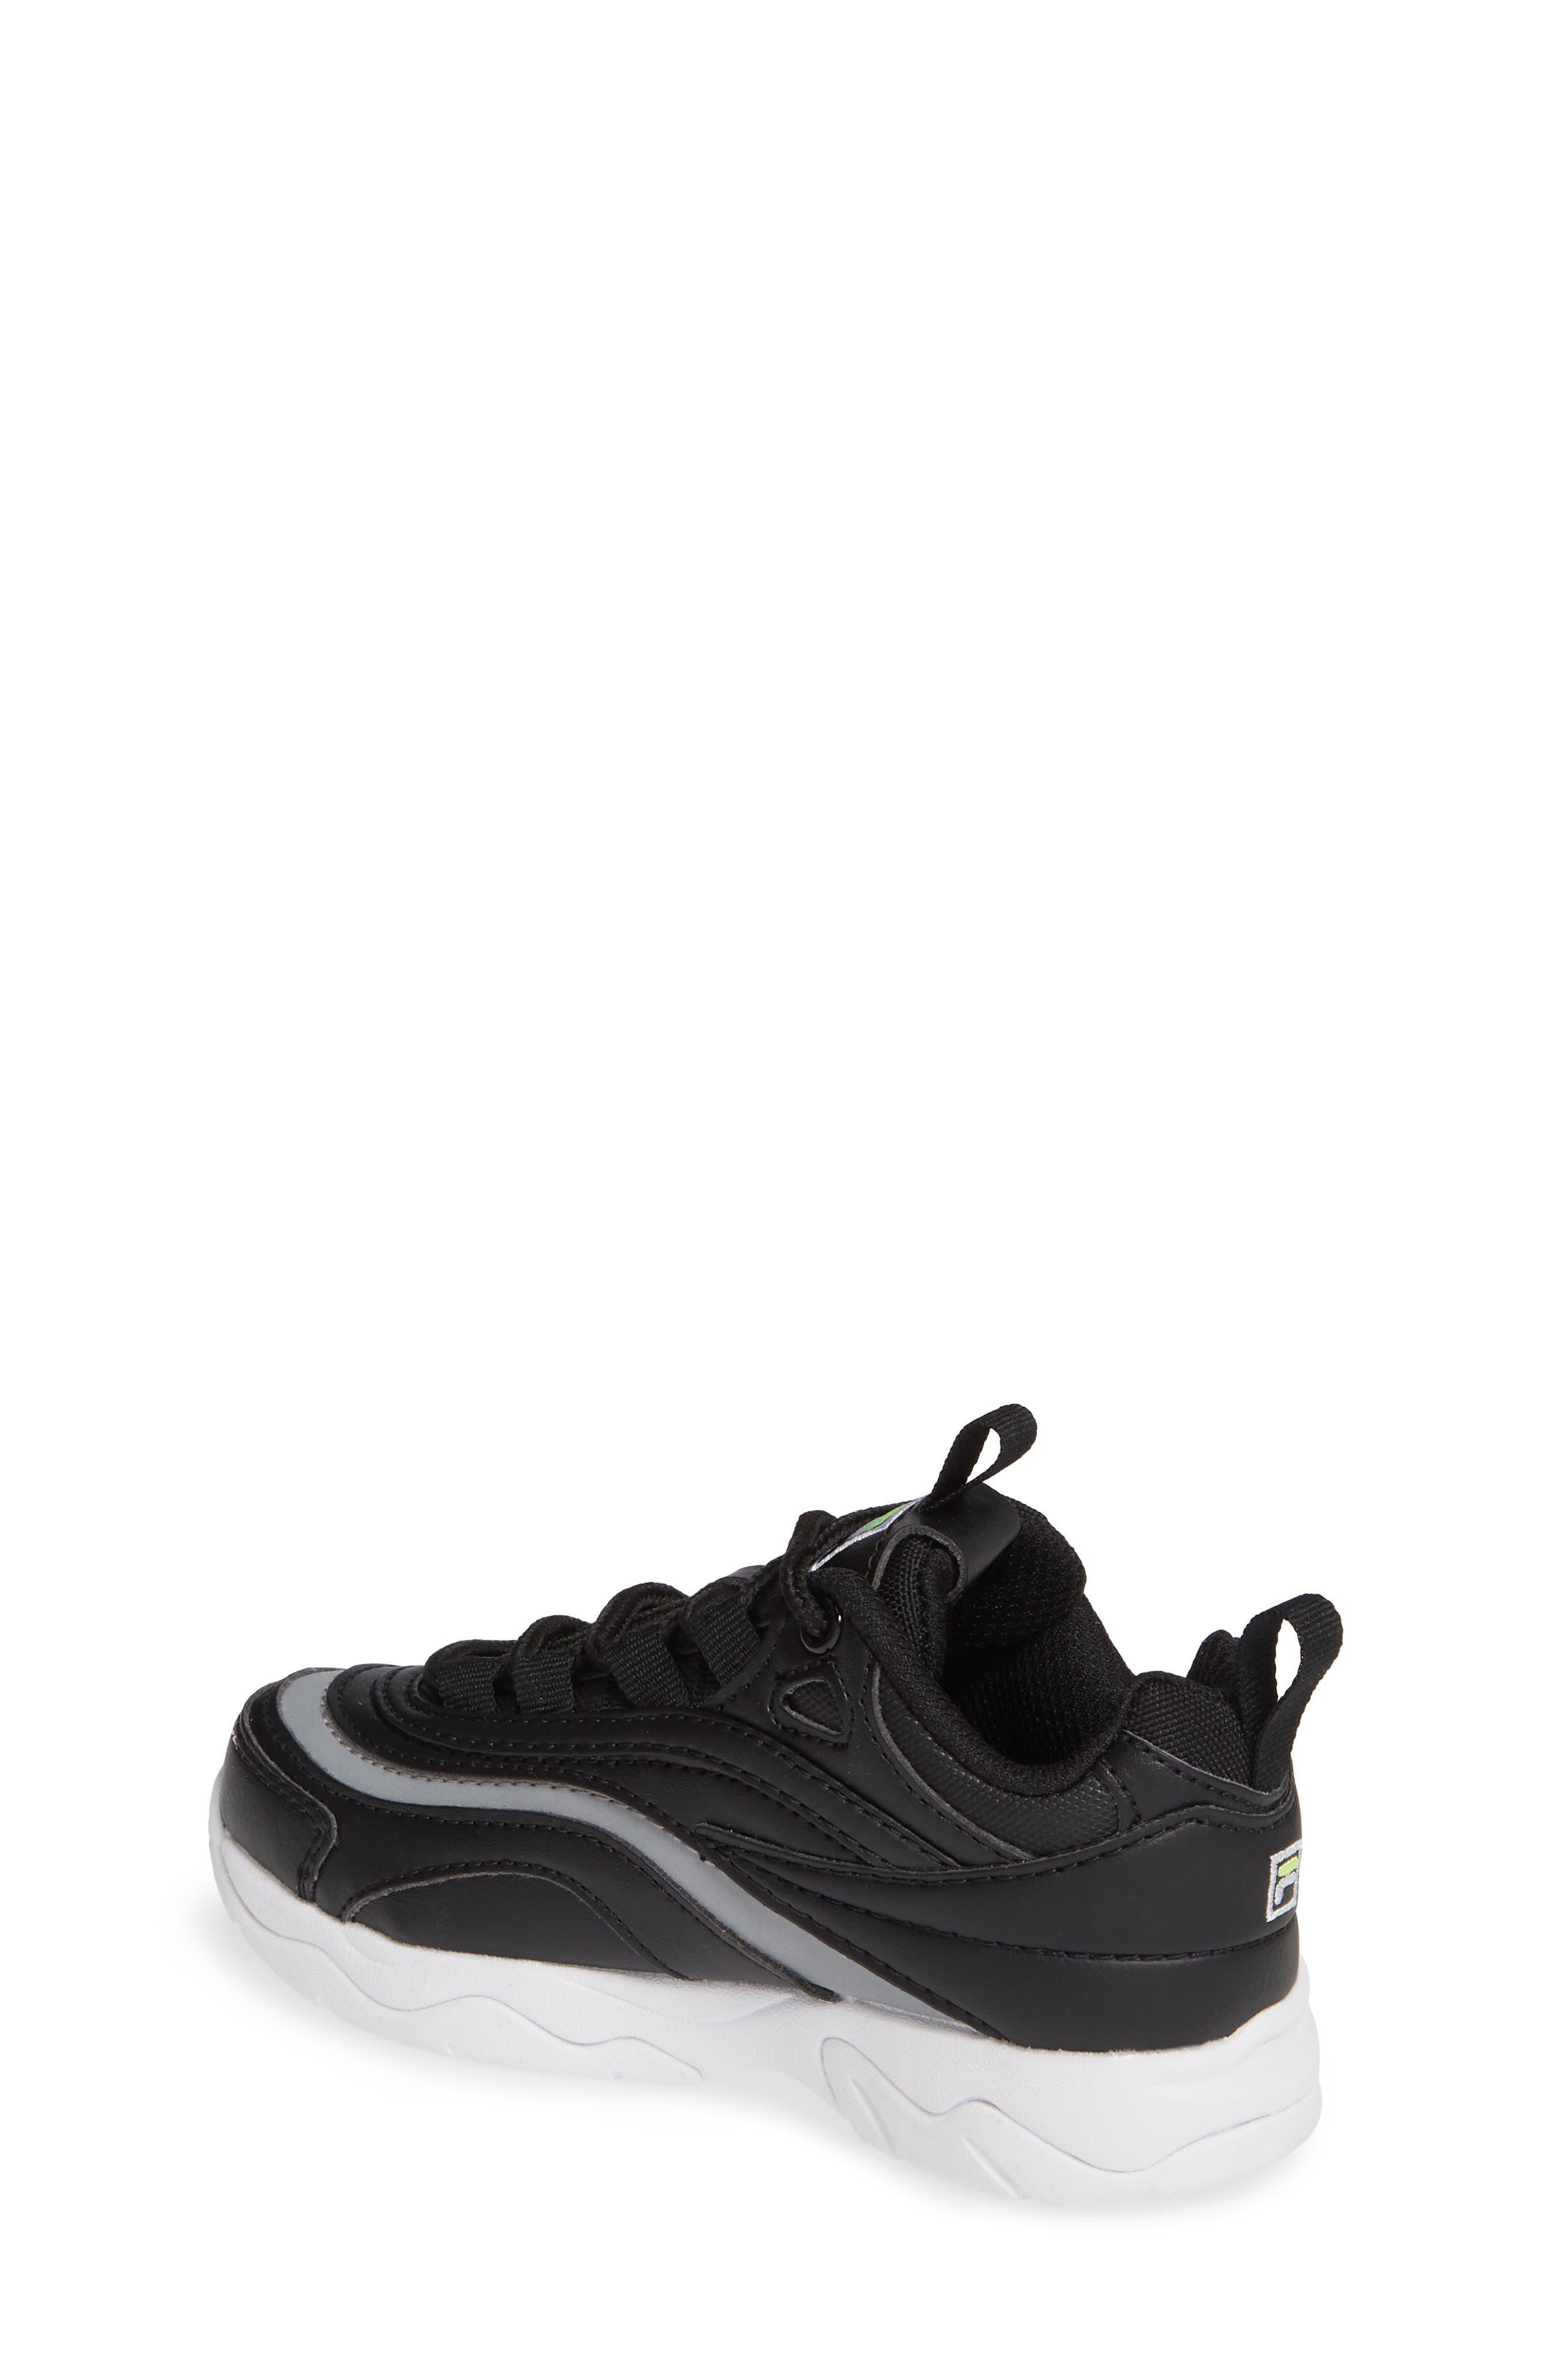 FILA,                             Ray Sneaker,                             Alternate thumbnail 2, color,                             BLACK/ SAFETY YELLOW/ SILVER